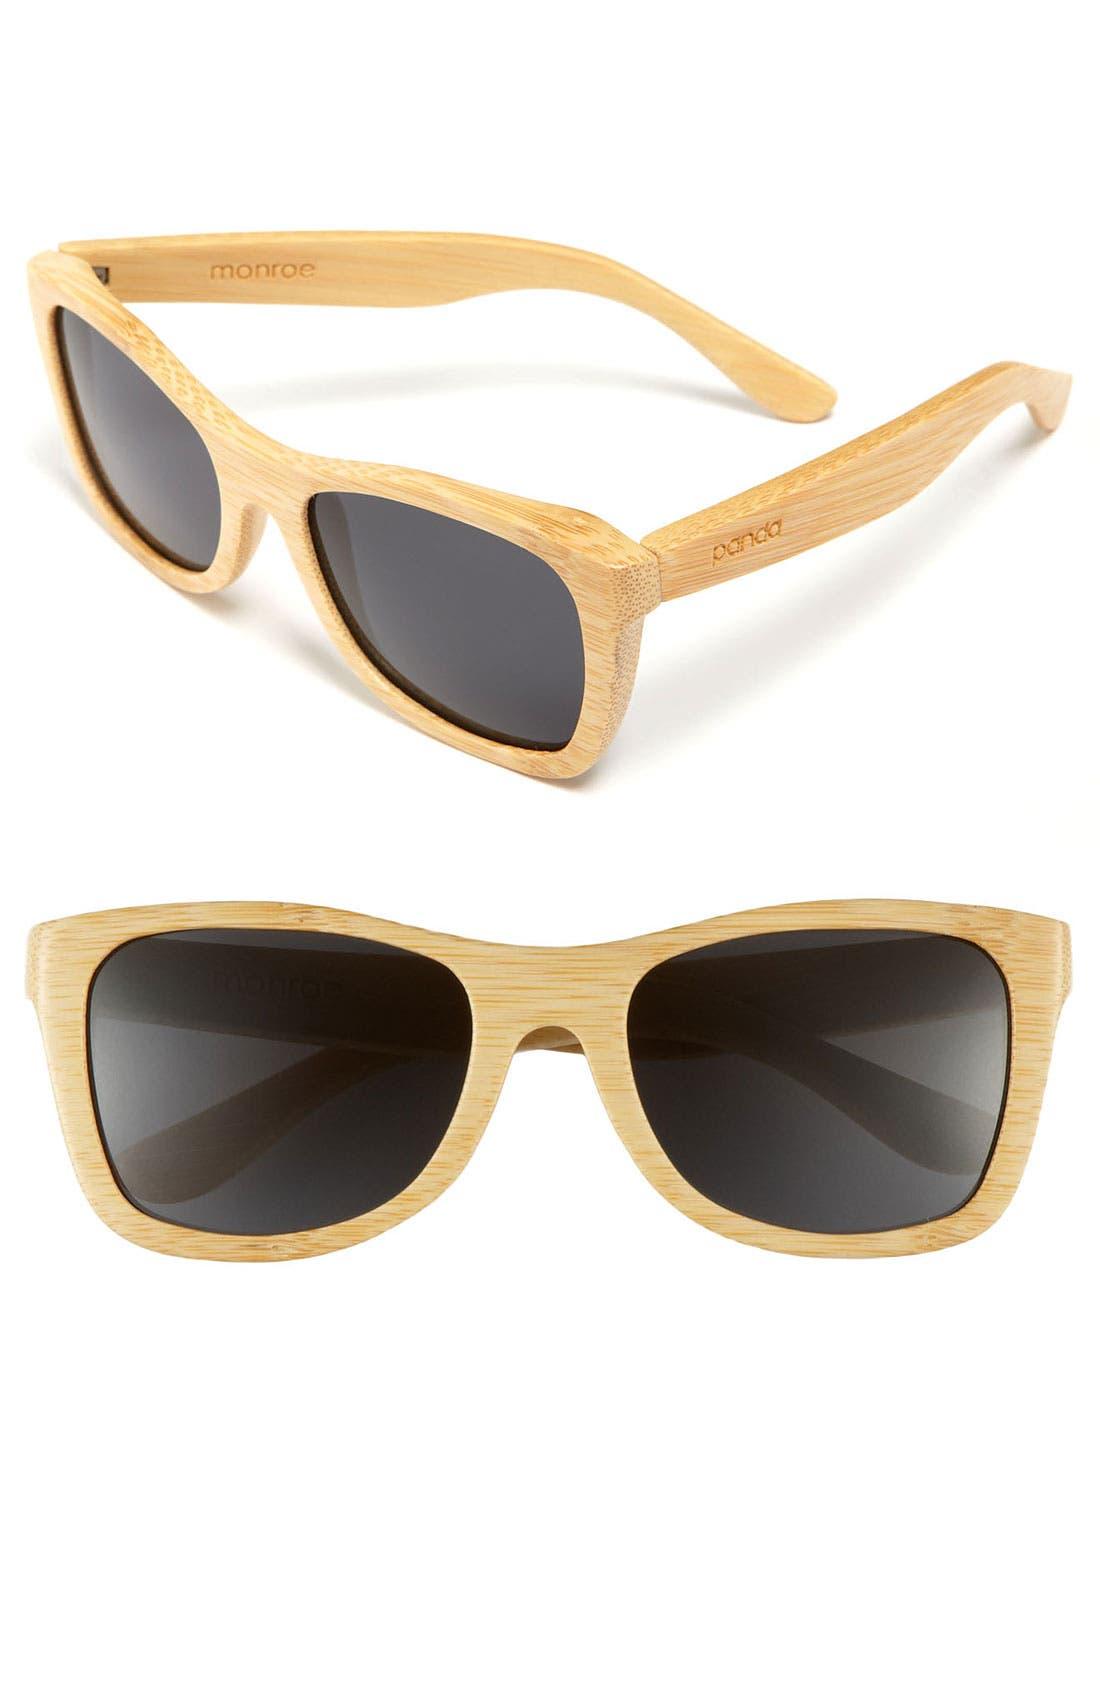 Alternate Image 1 Selected - Panda™ 'Monroe' Sunglasses